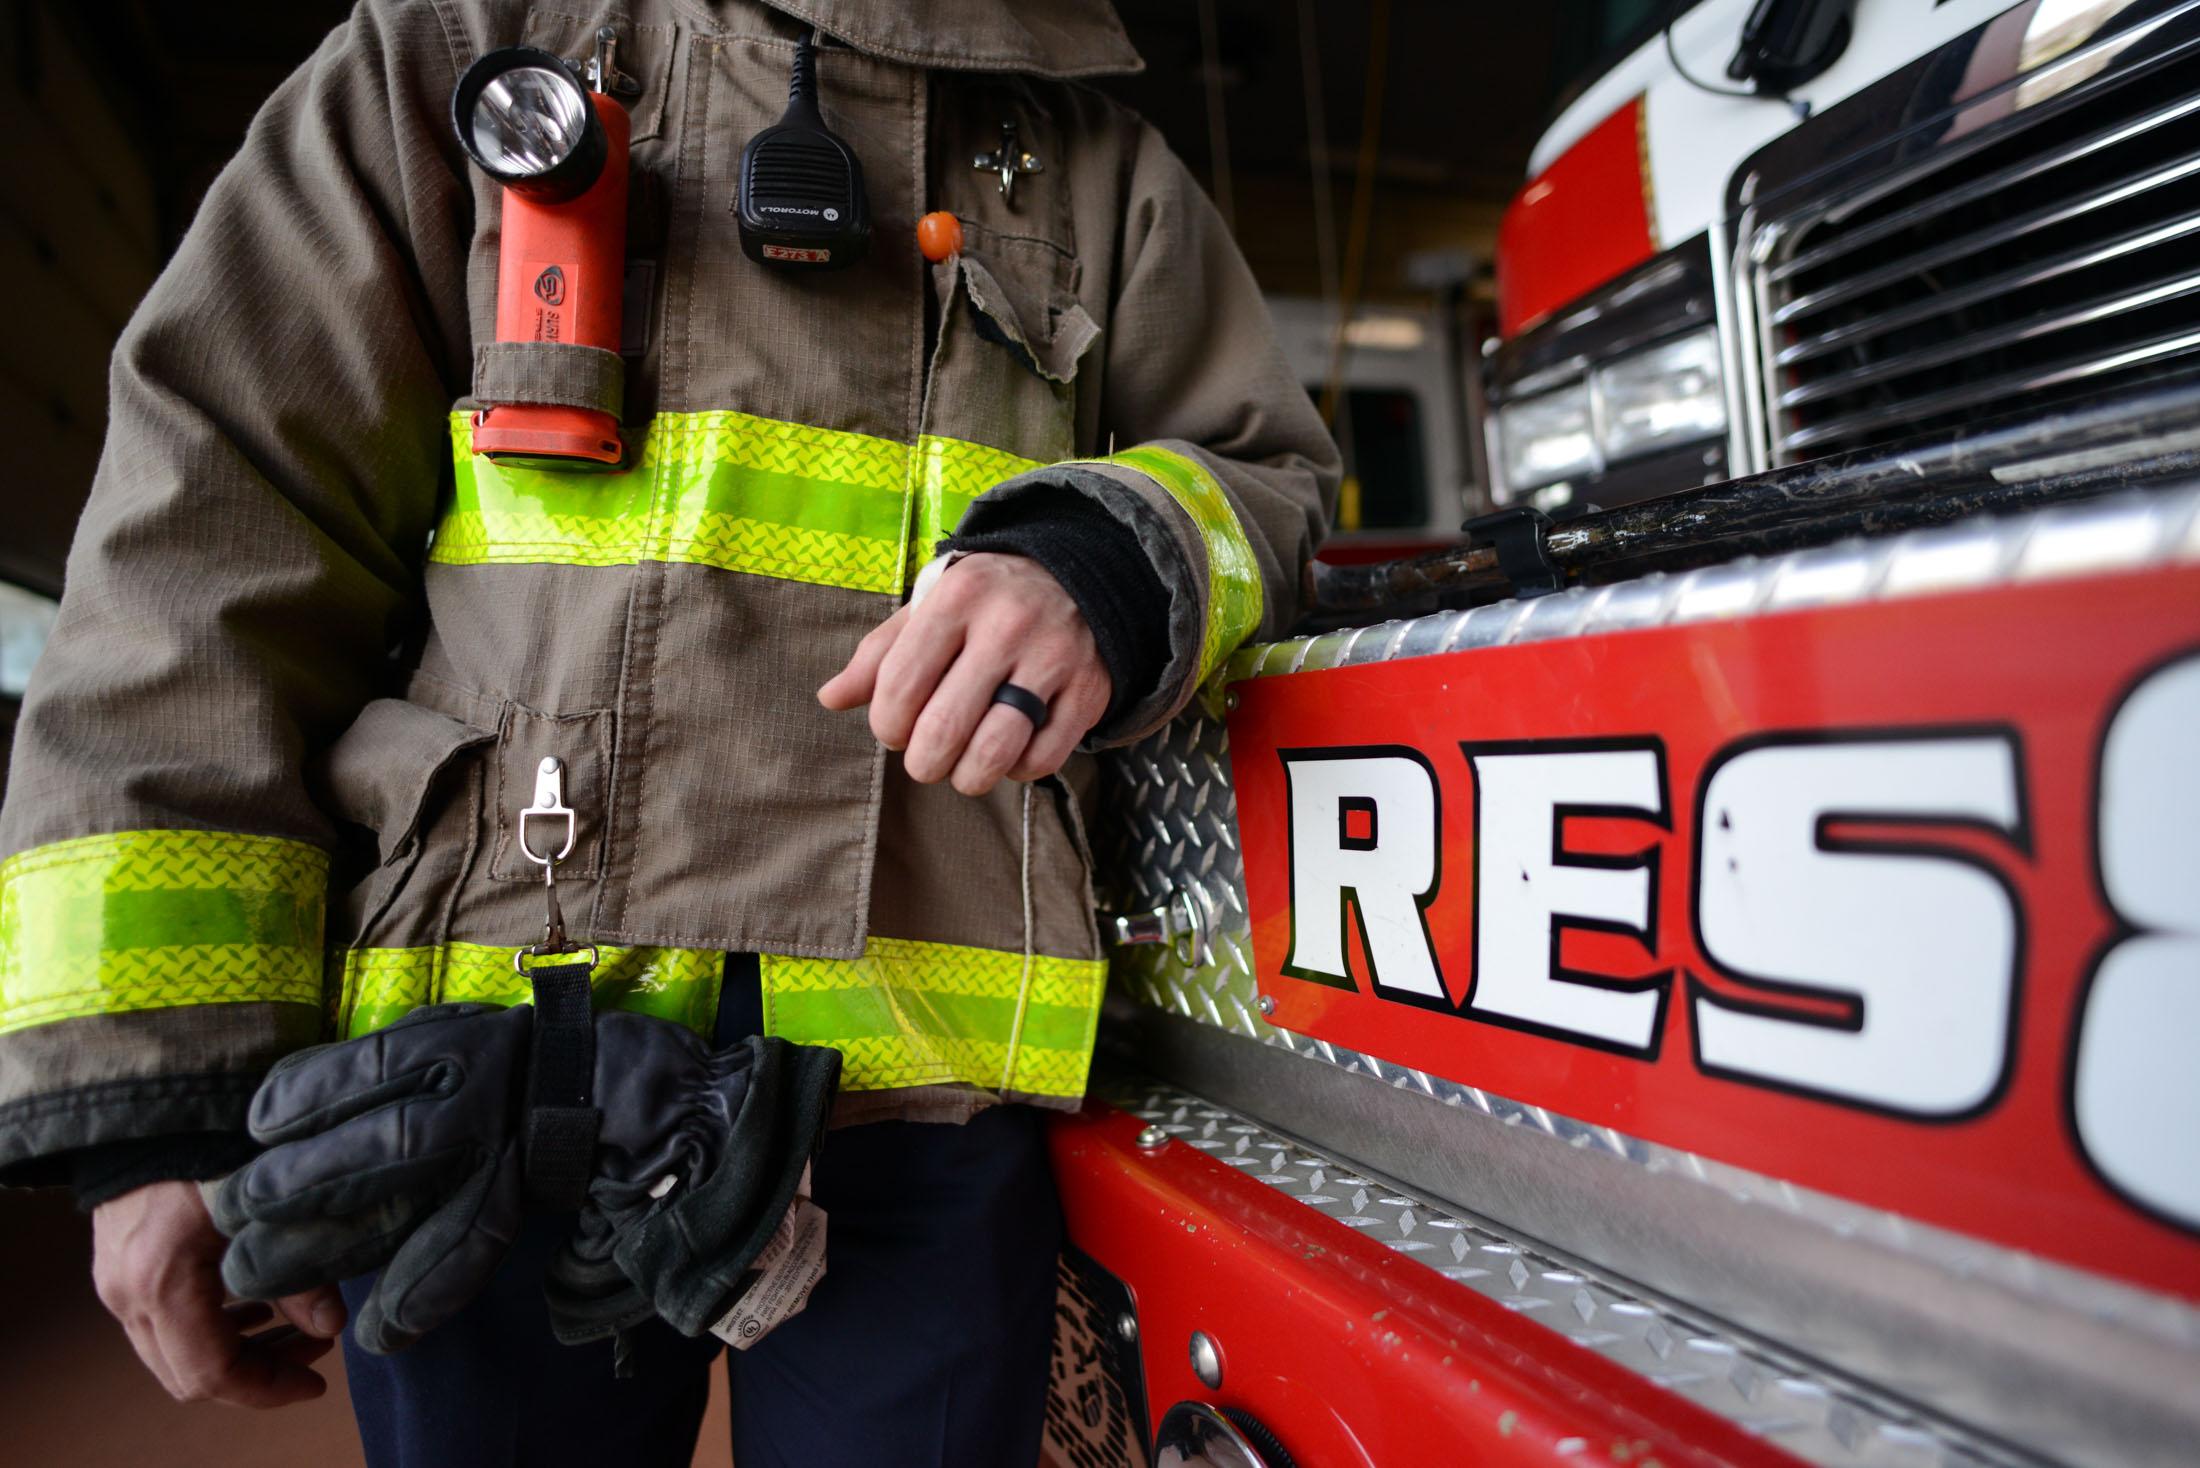 Fire RECON NGFD DPM_4490.jpg